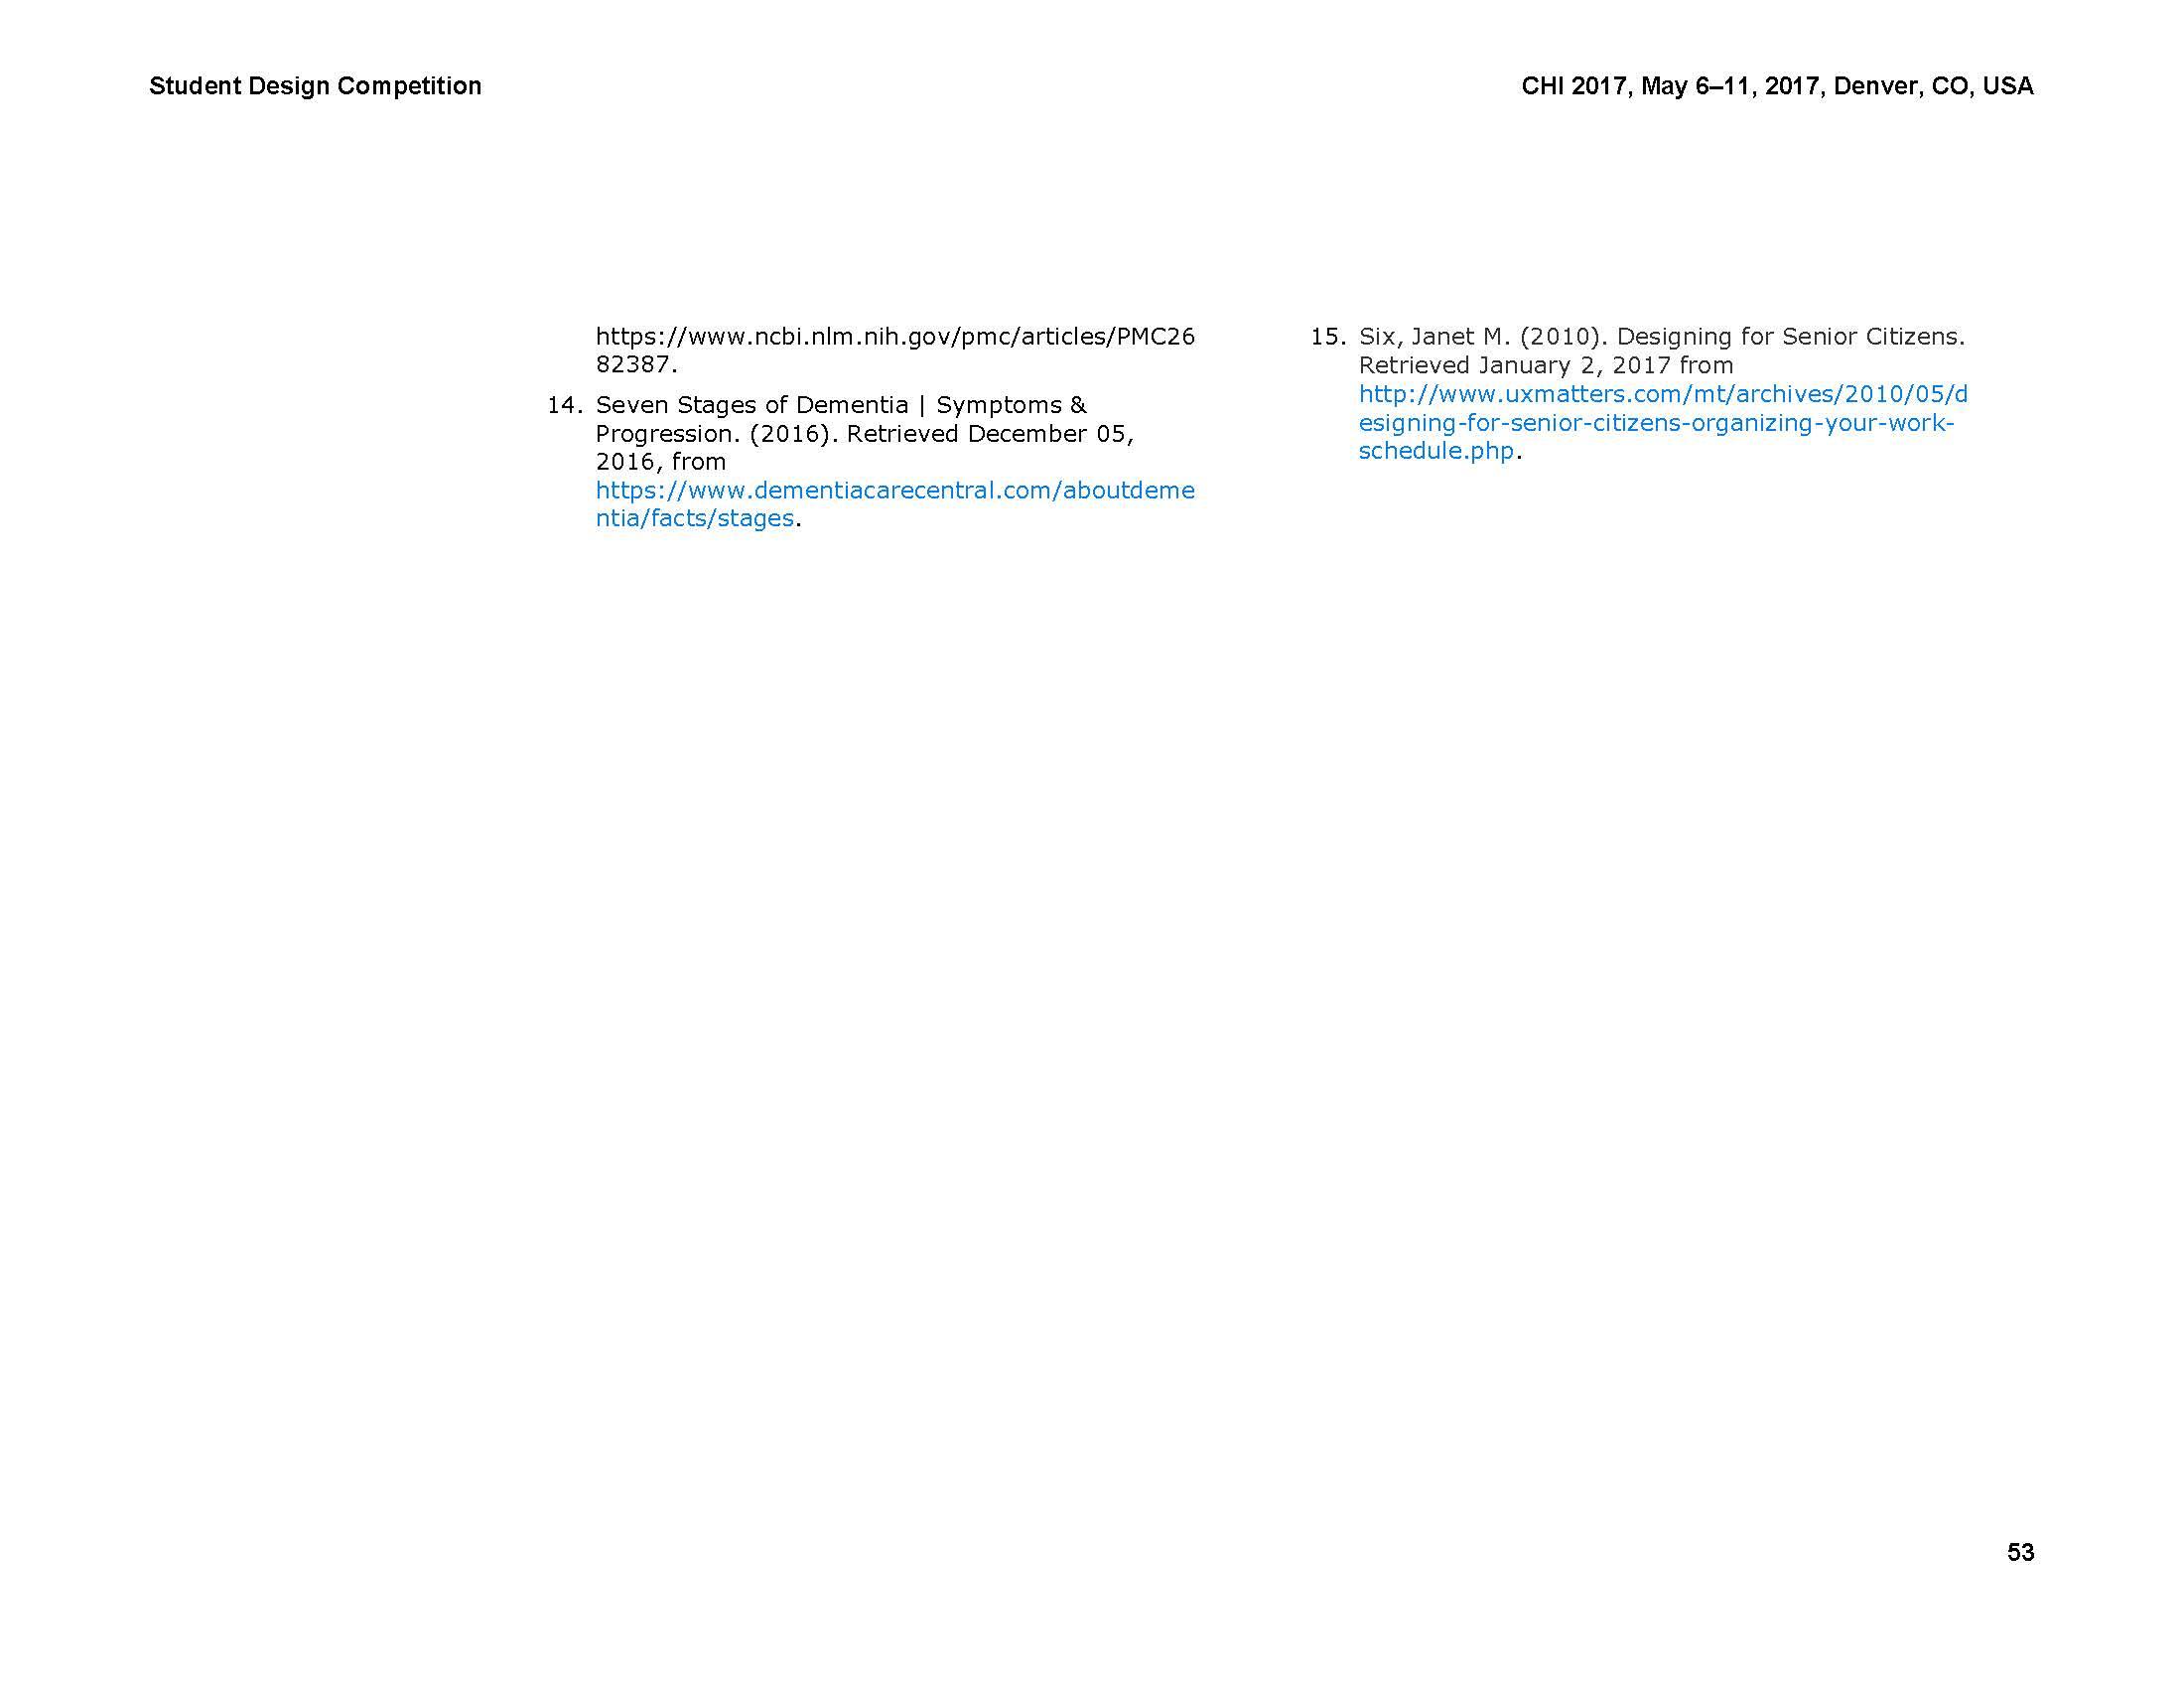 Robin paper final_Page_8.jpg